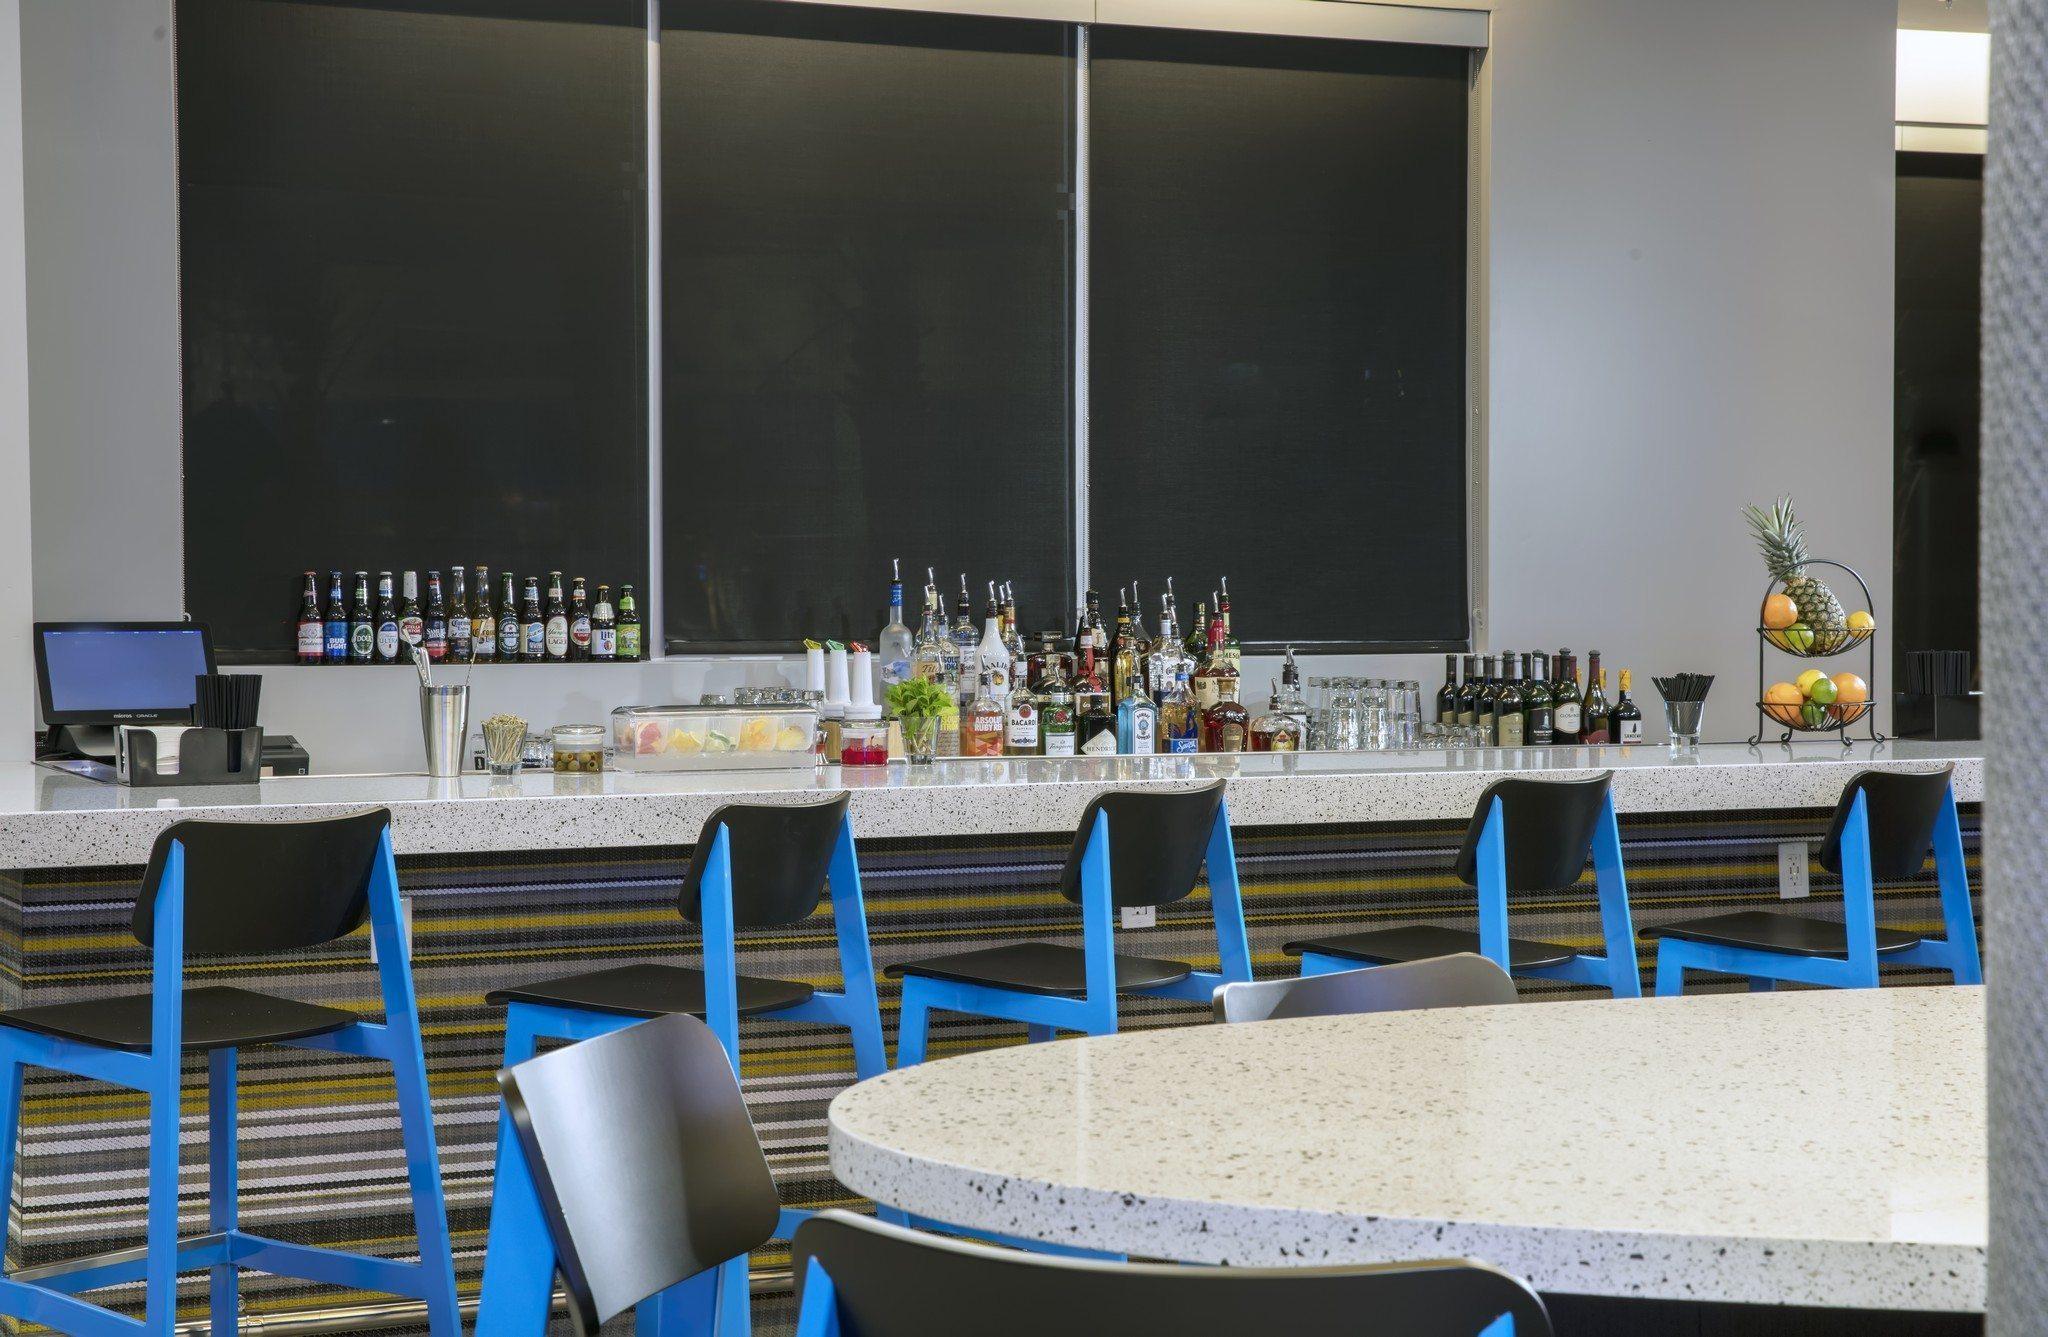 Fairfield Inn & Suites Daytona Beach Speedway/Airport bar area